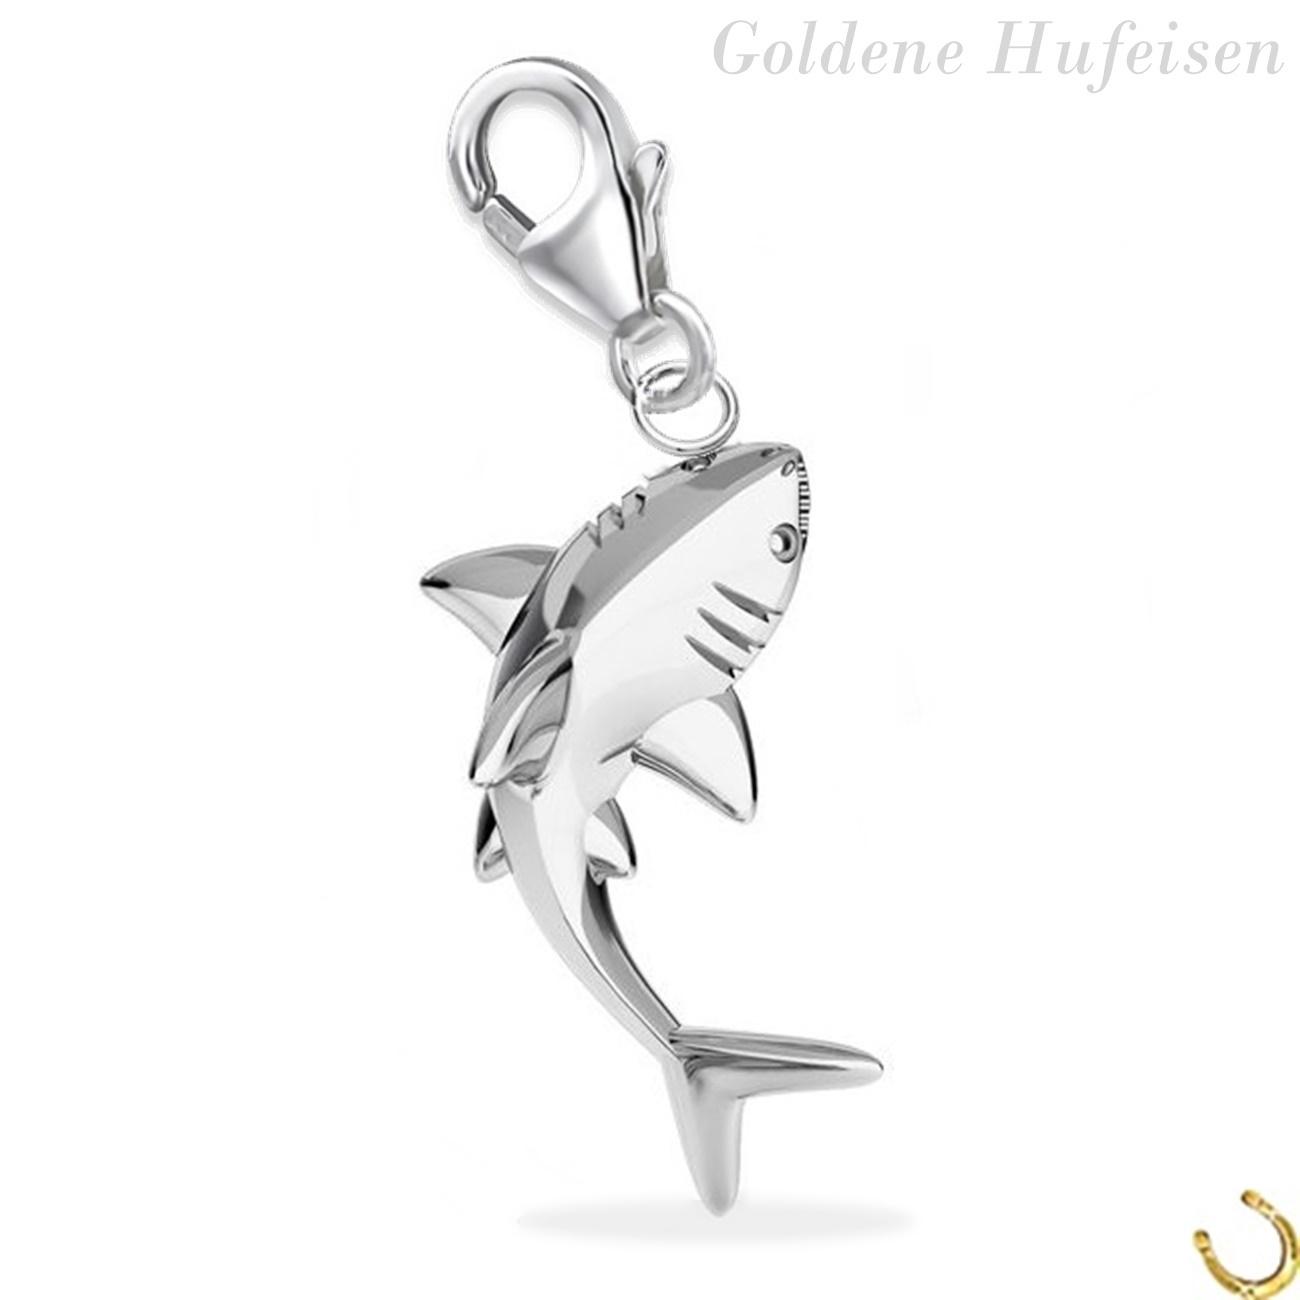 3D Fisch Charm Anhänger Damen 925 Silber für Armband